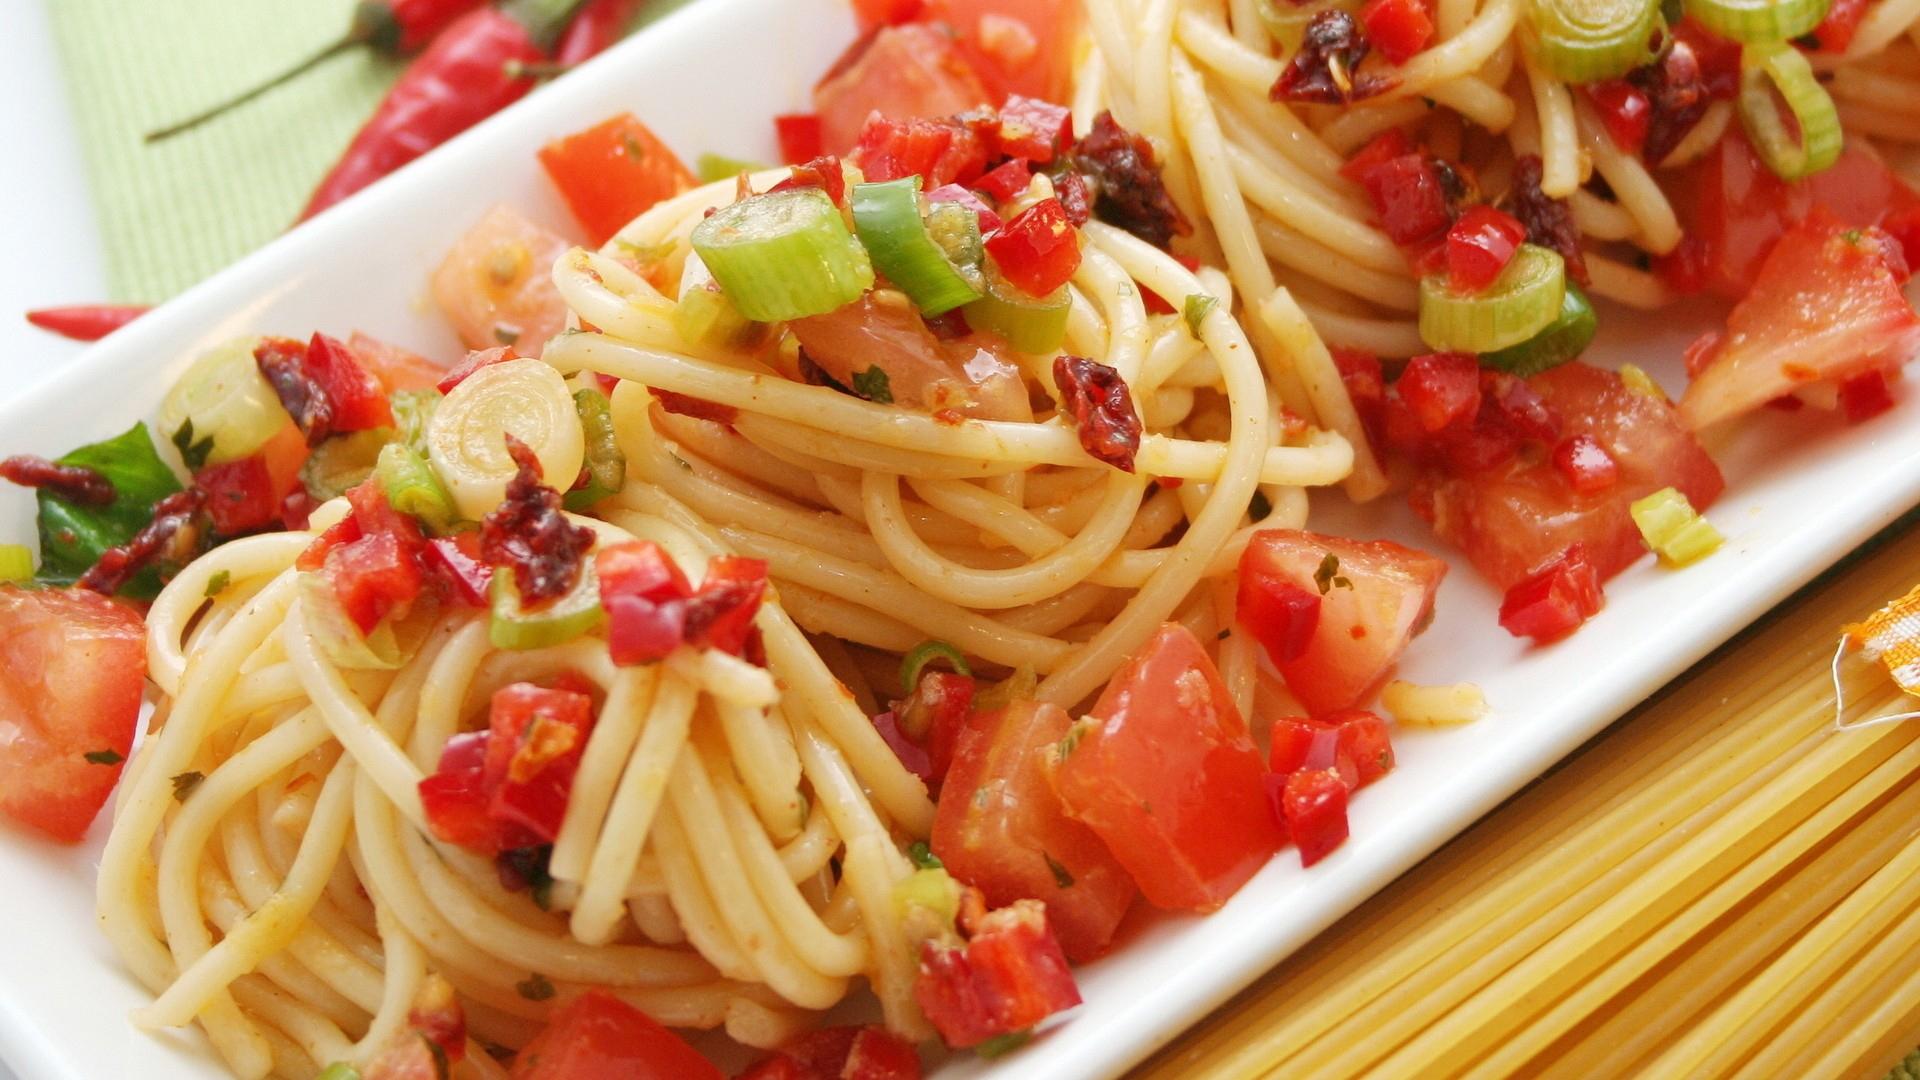 pasta_vegetables_sauce_70073_1920x1080